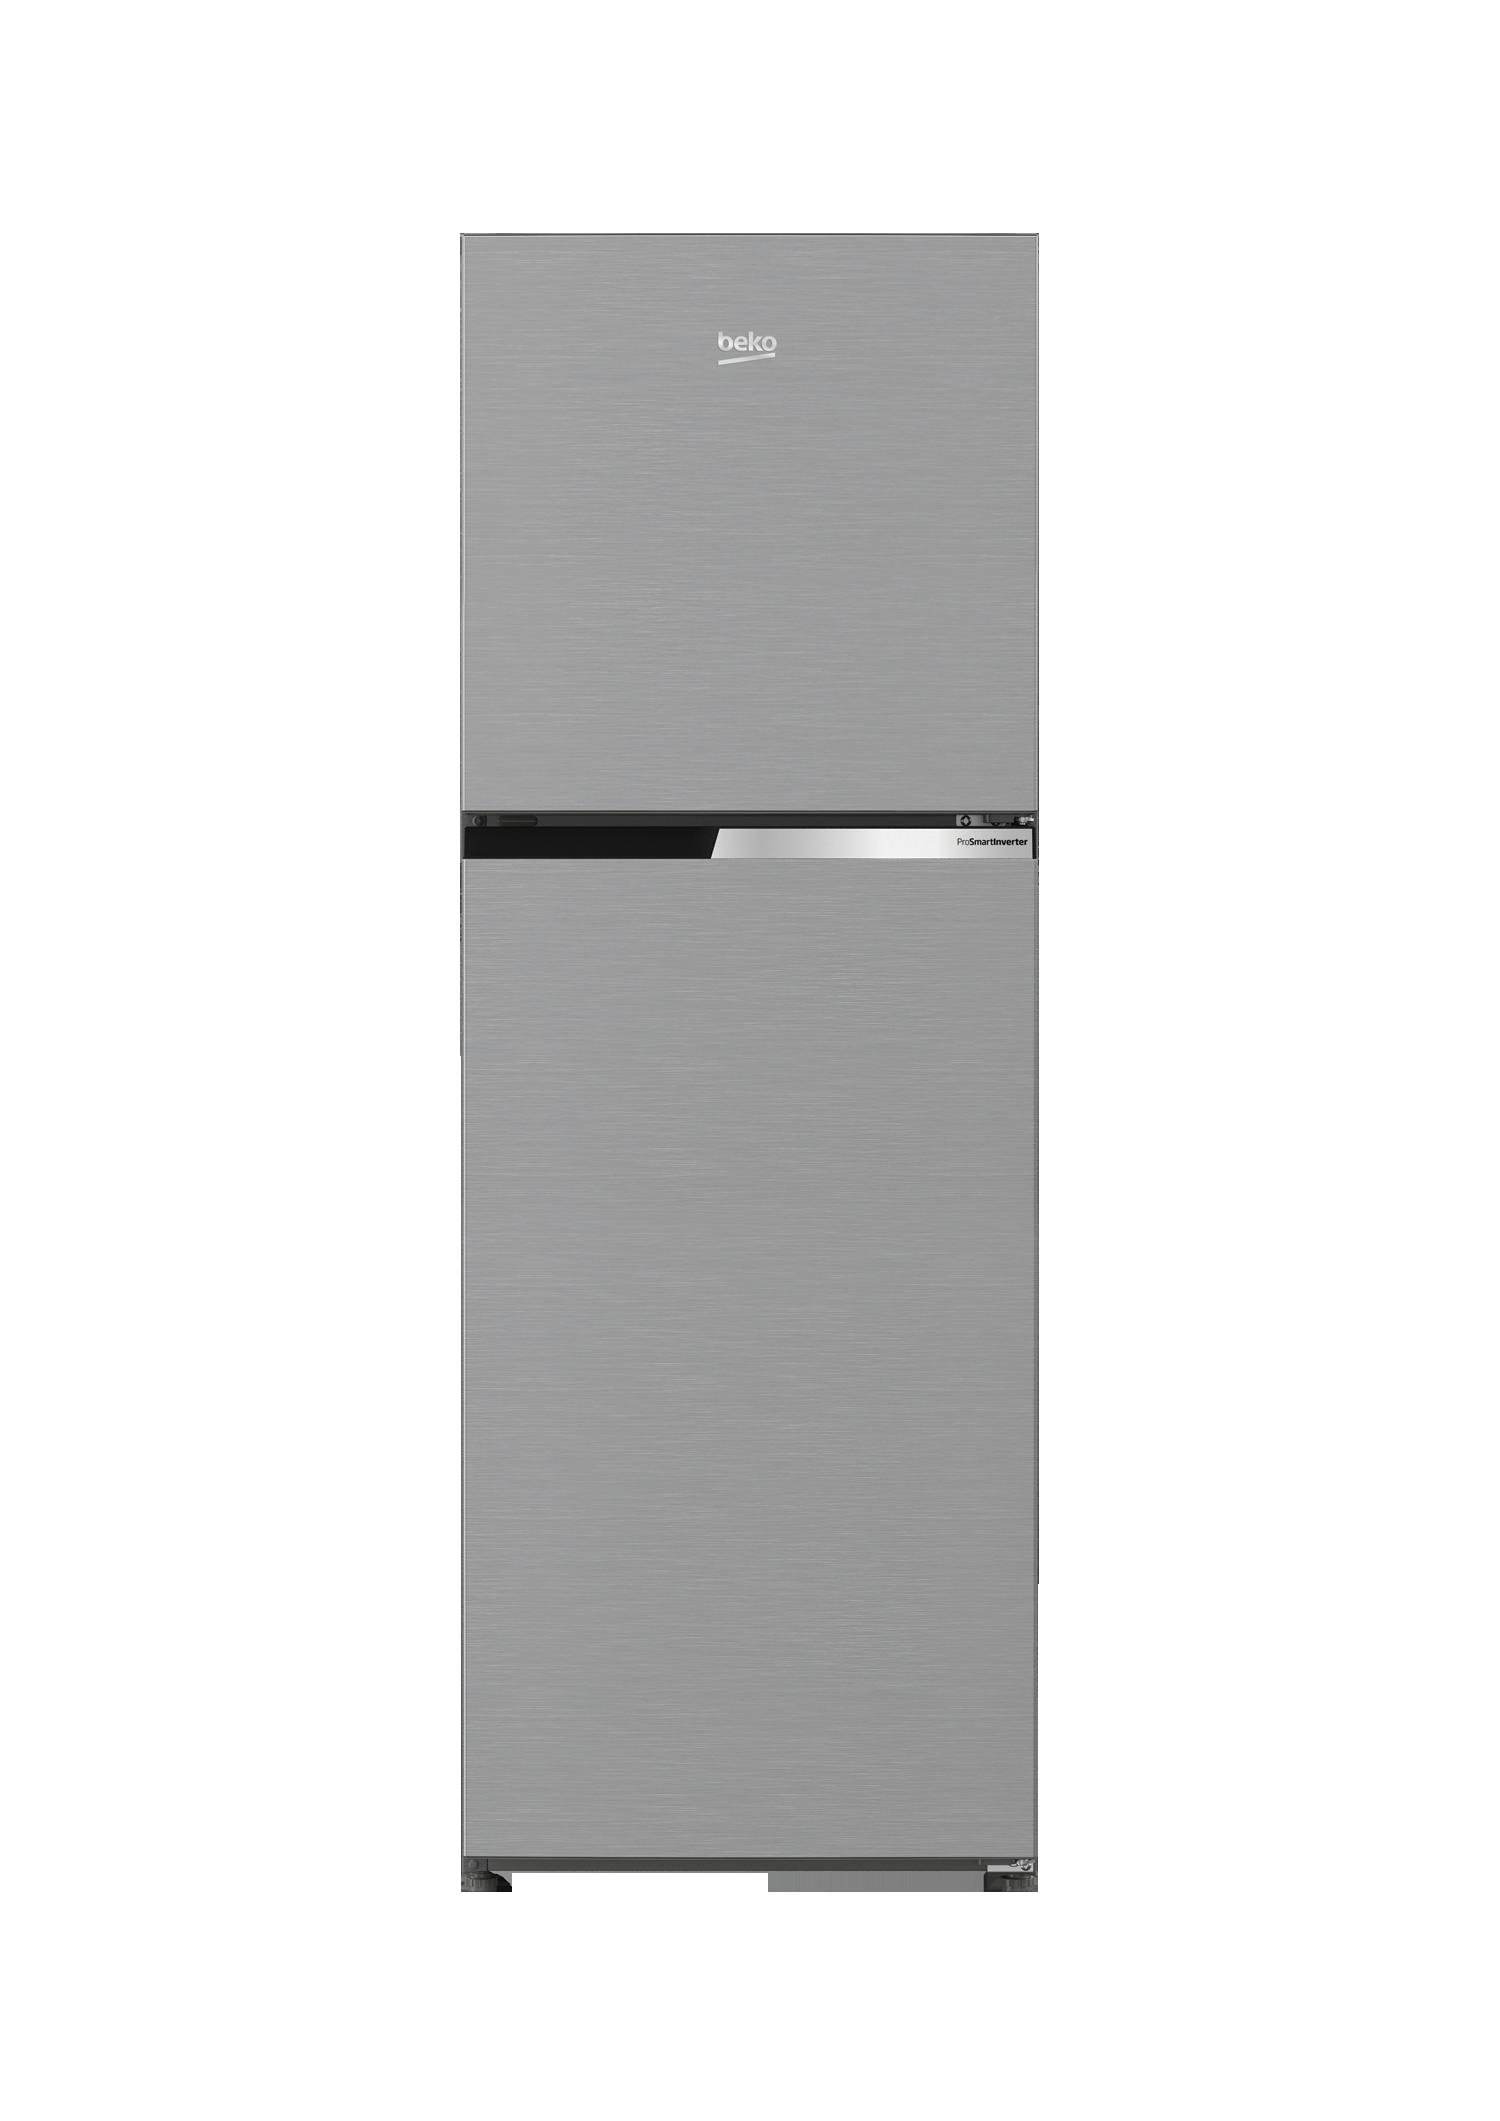 BEKO 250 Liter Top Freezer Refrigerator RDNT300XS